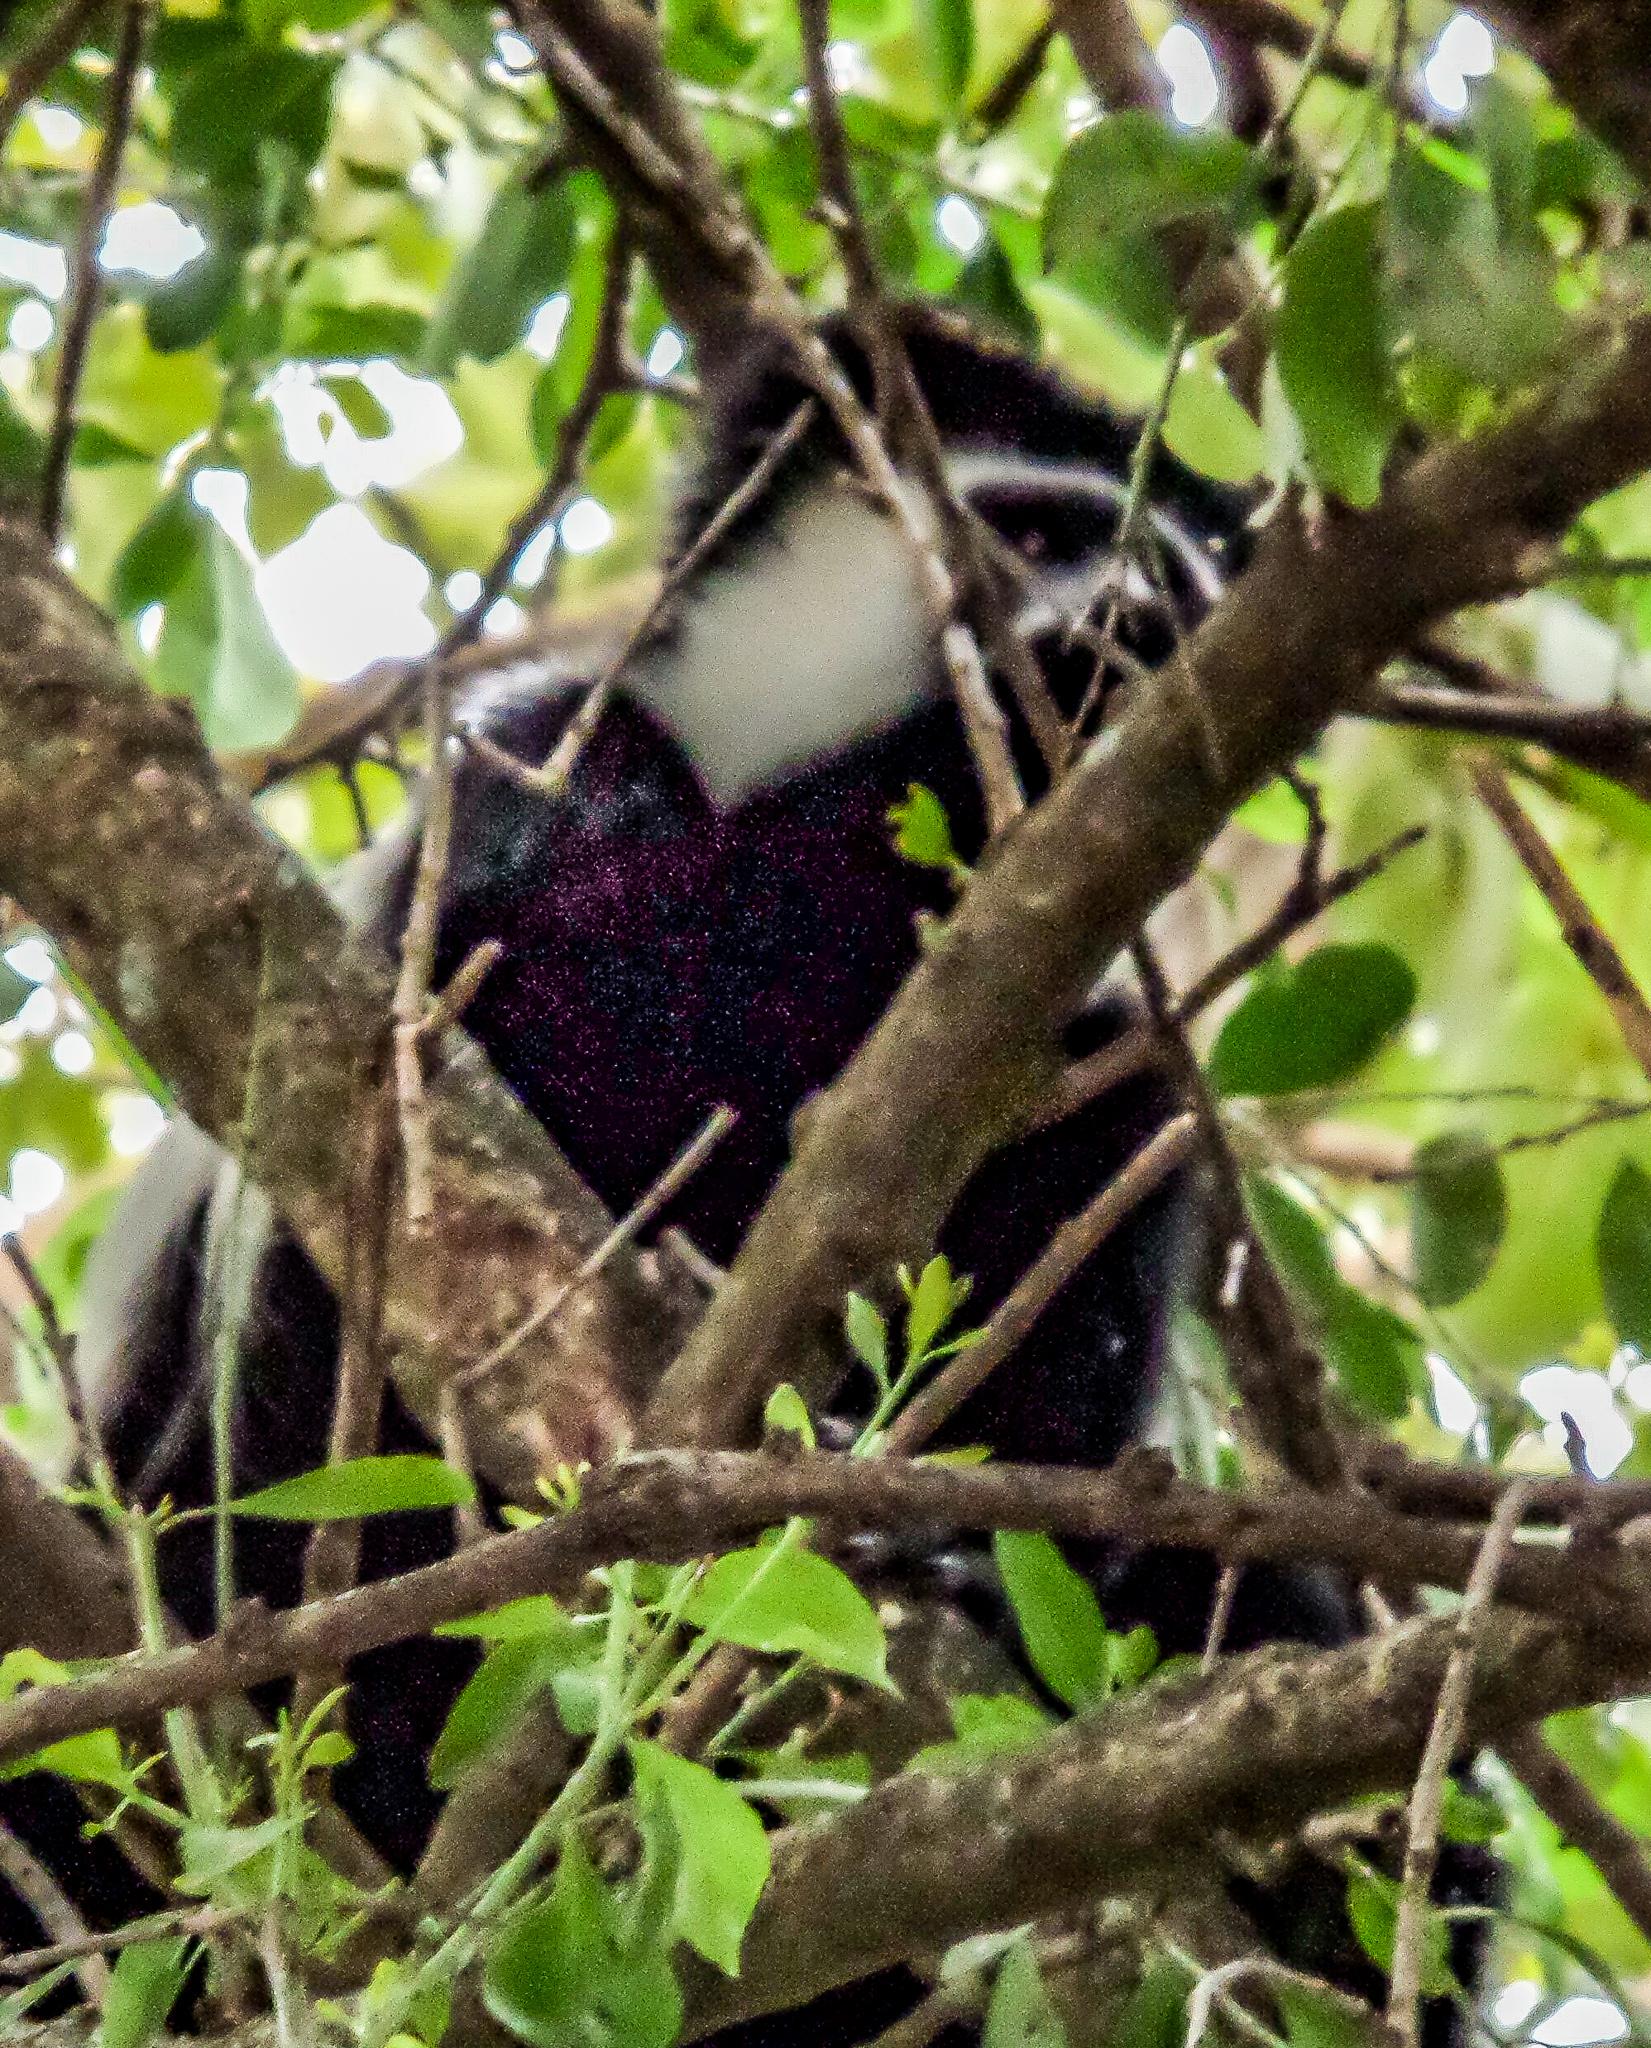 Colobus monkey in Ethiopia